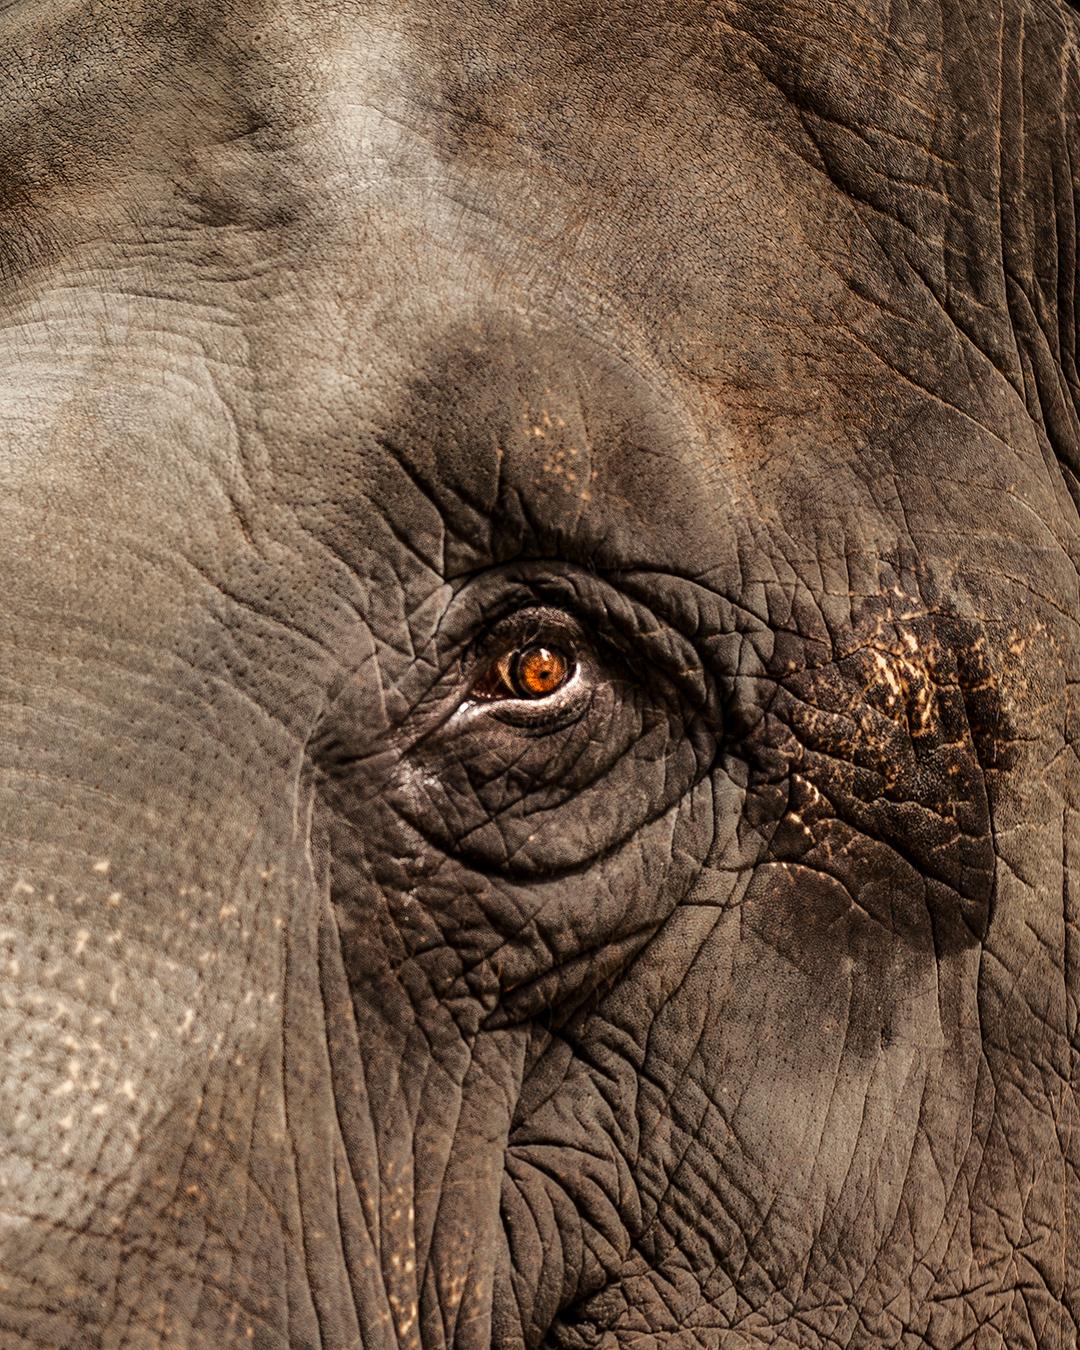 Akyra_ElephantEye_IG.JPG